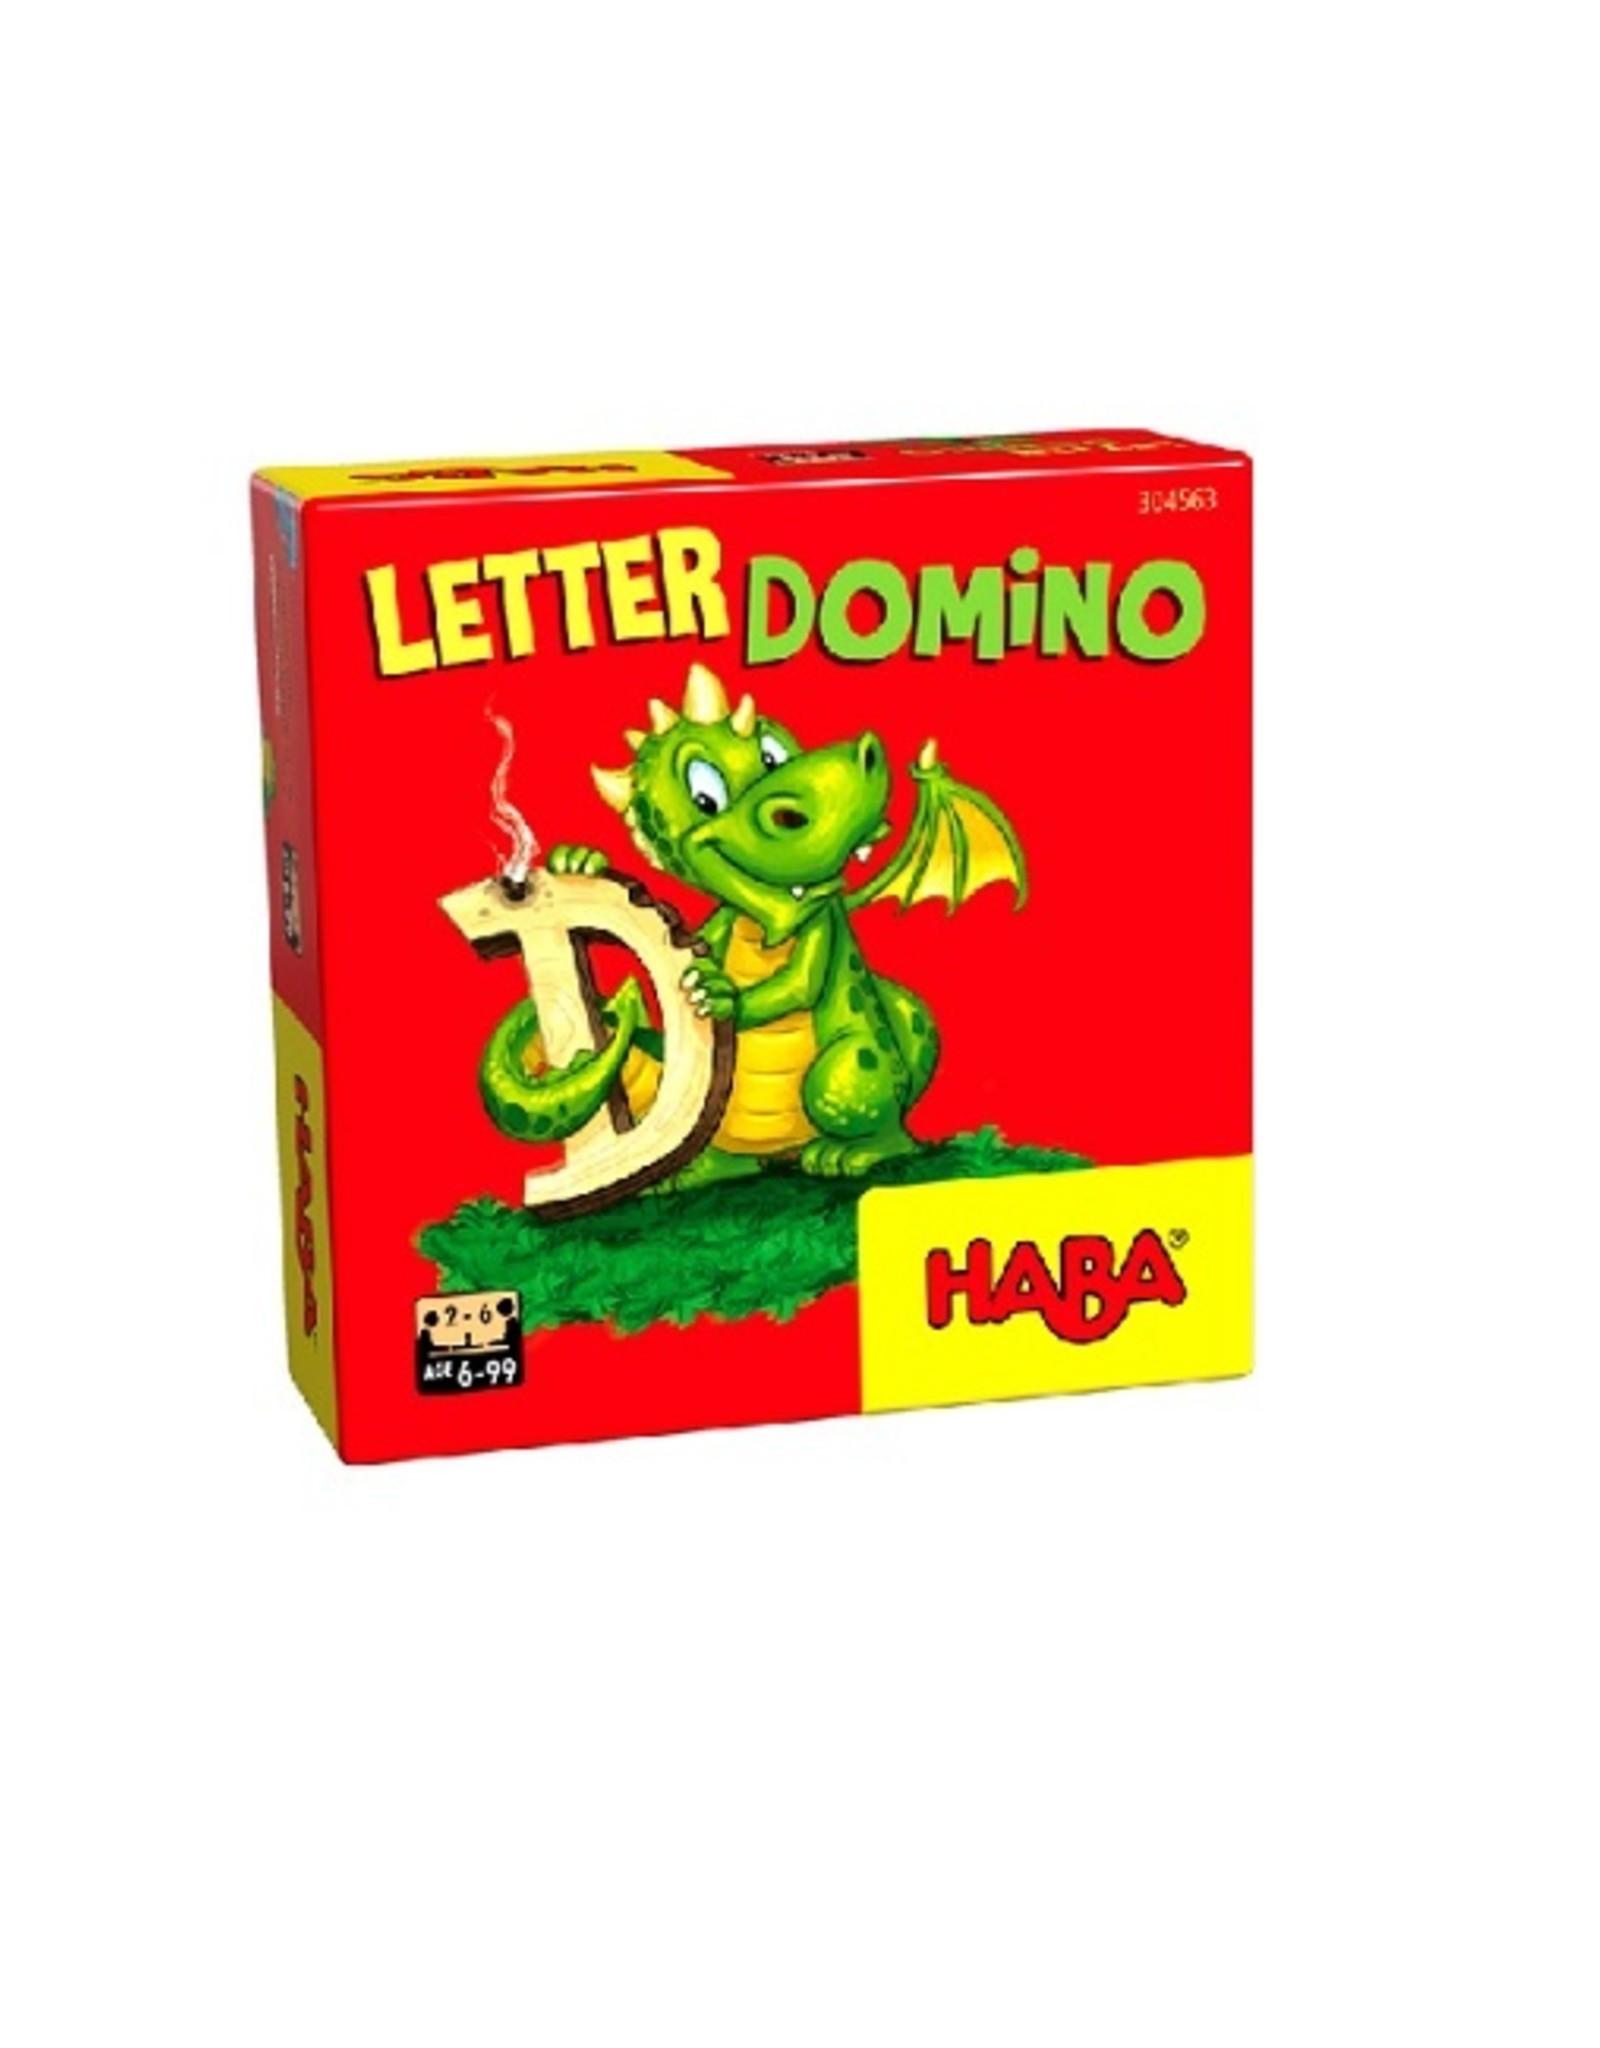 Haba Letterdomino 304563